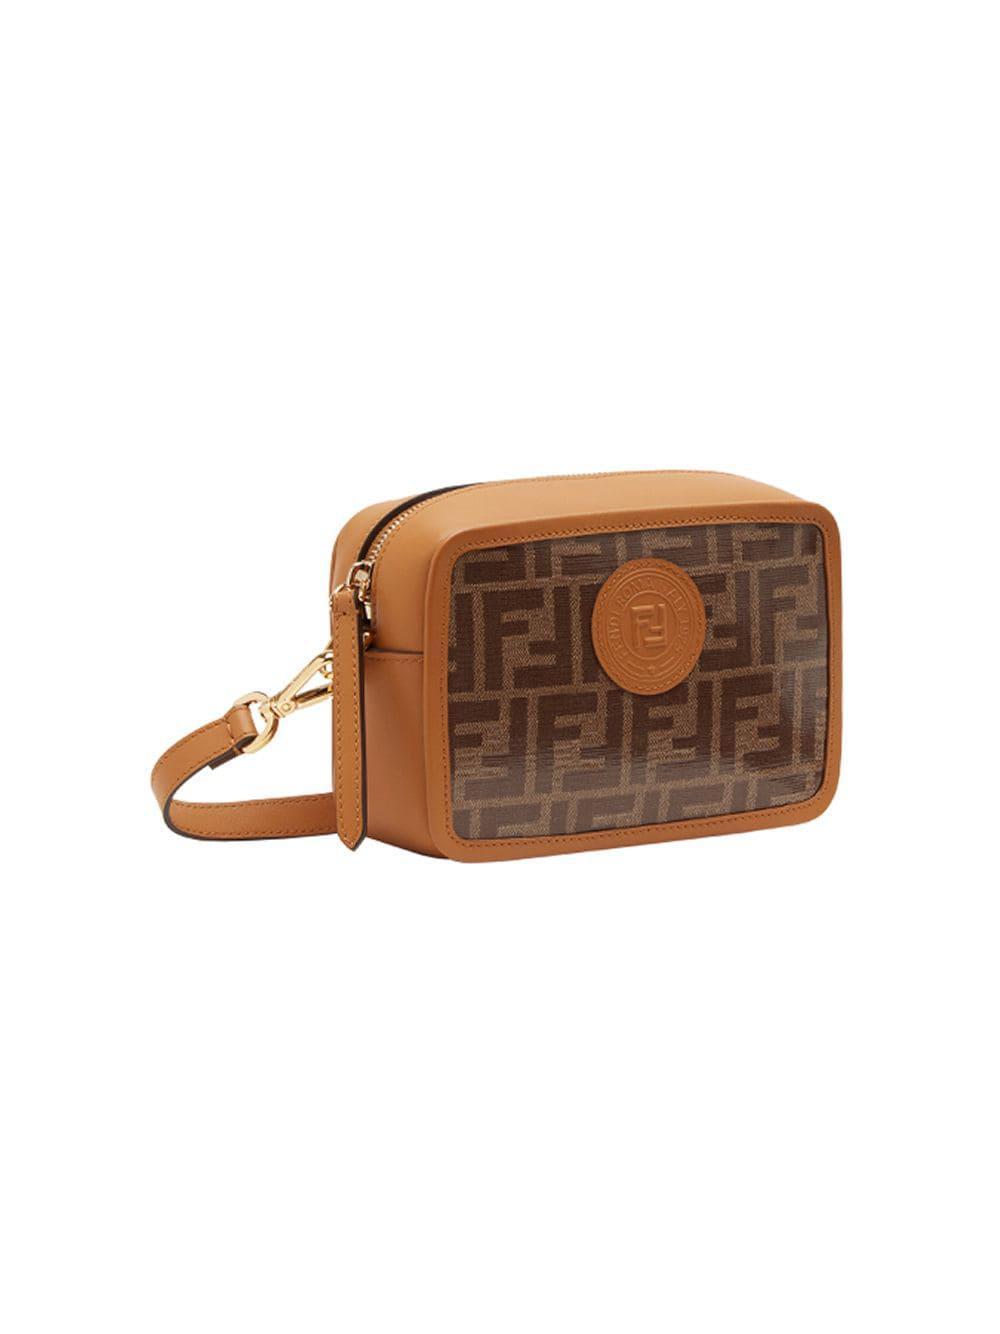 76f231cb94de Lyst - Fendi Mini Camera Case Crossbody Bag in Brown